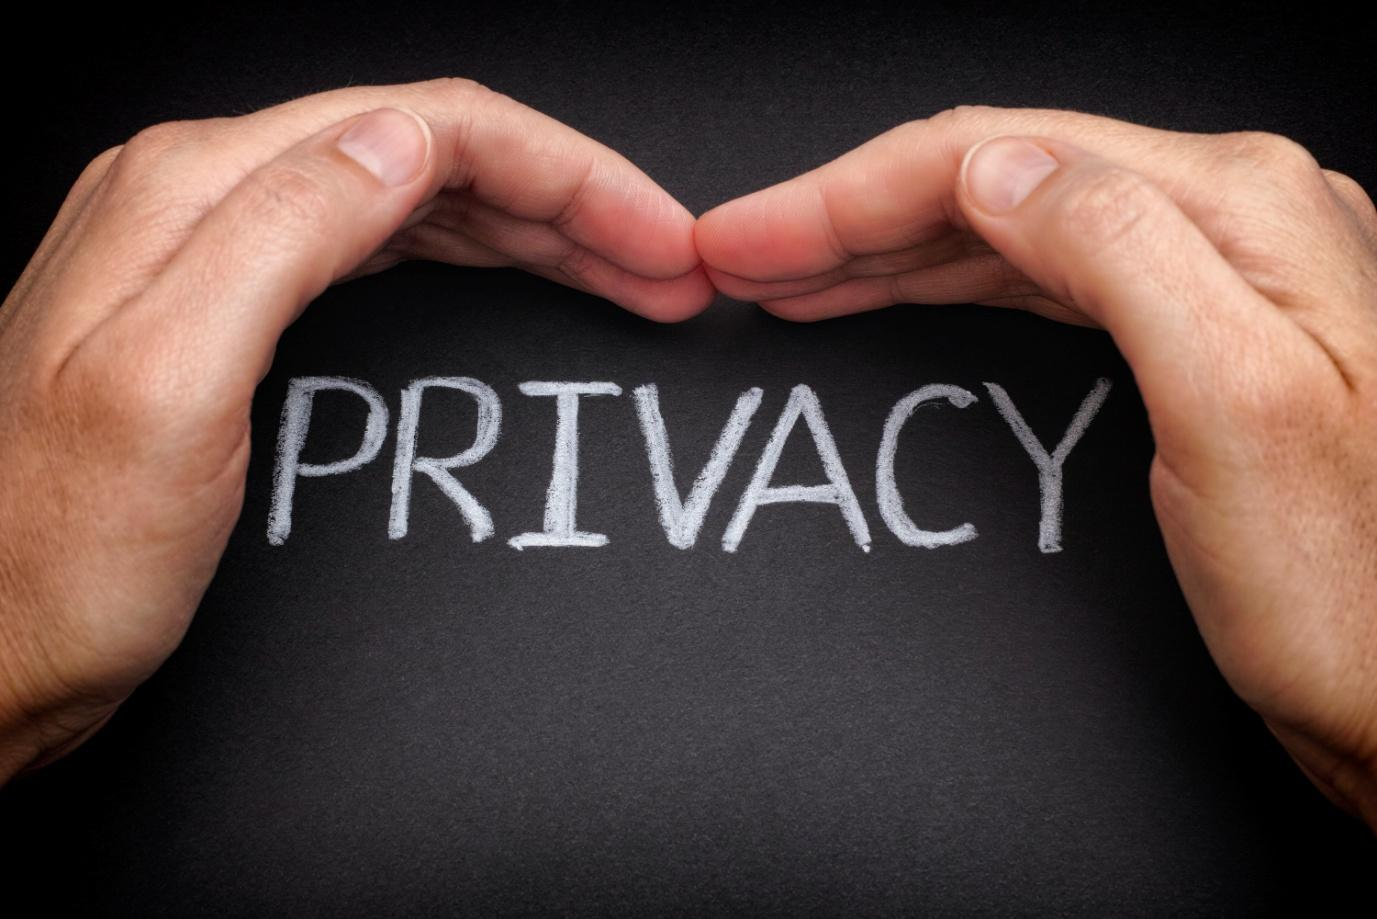 C:\Users\Korisnik\Desktop\Privacy.-Security-of-personal-data-513639320_3000x2000.jpeg